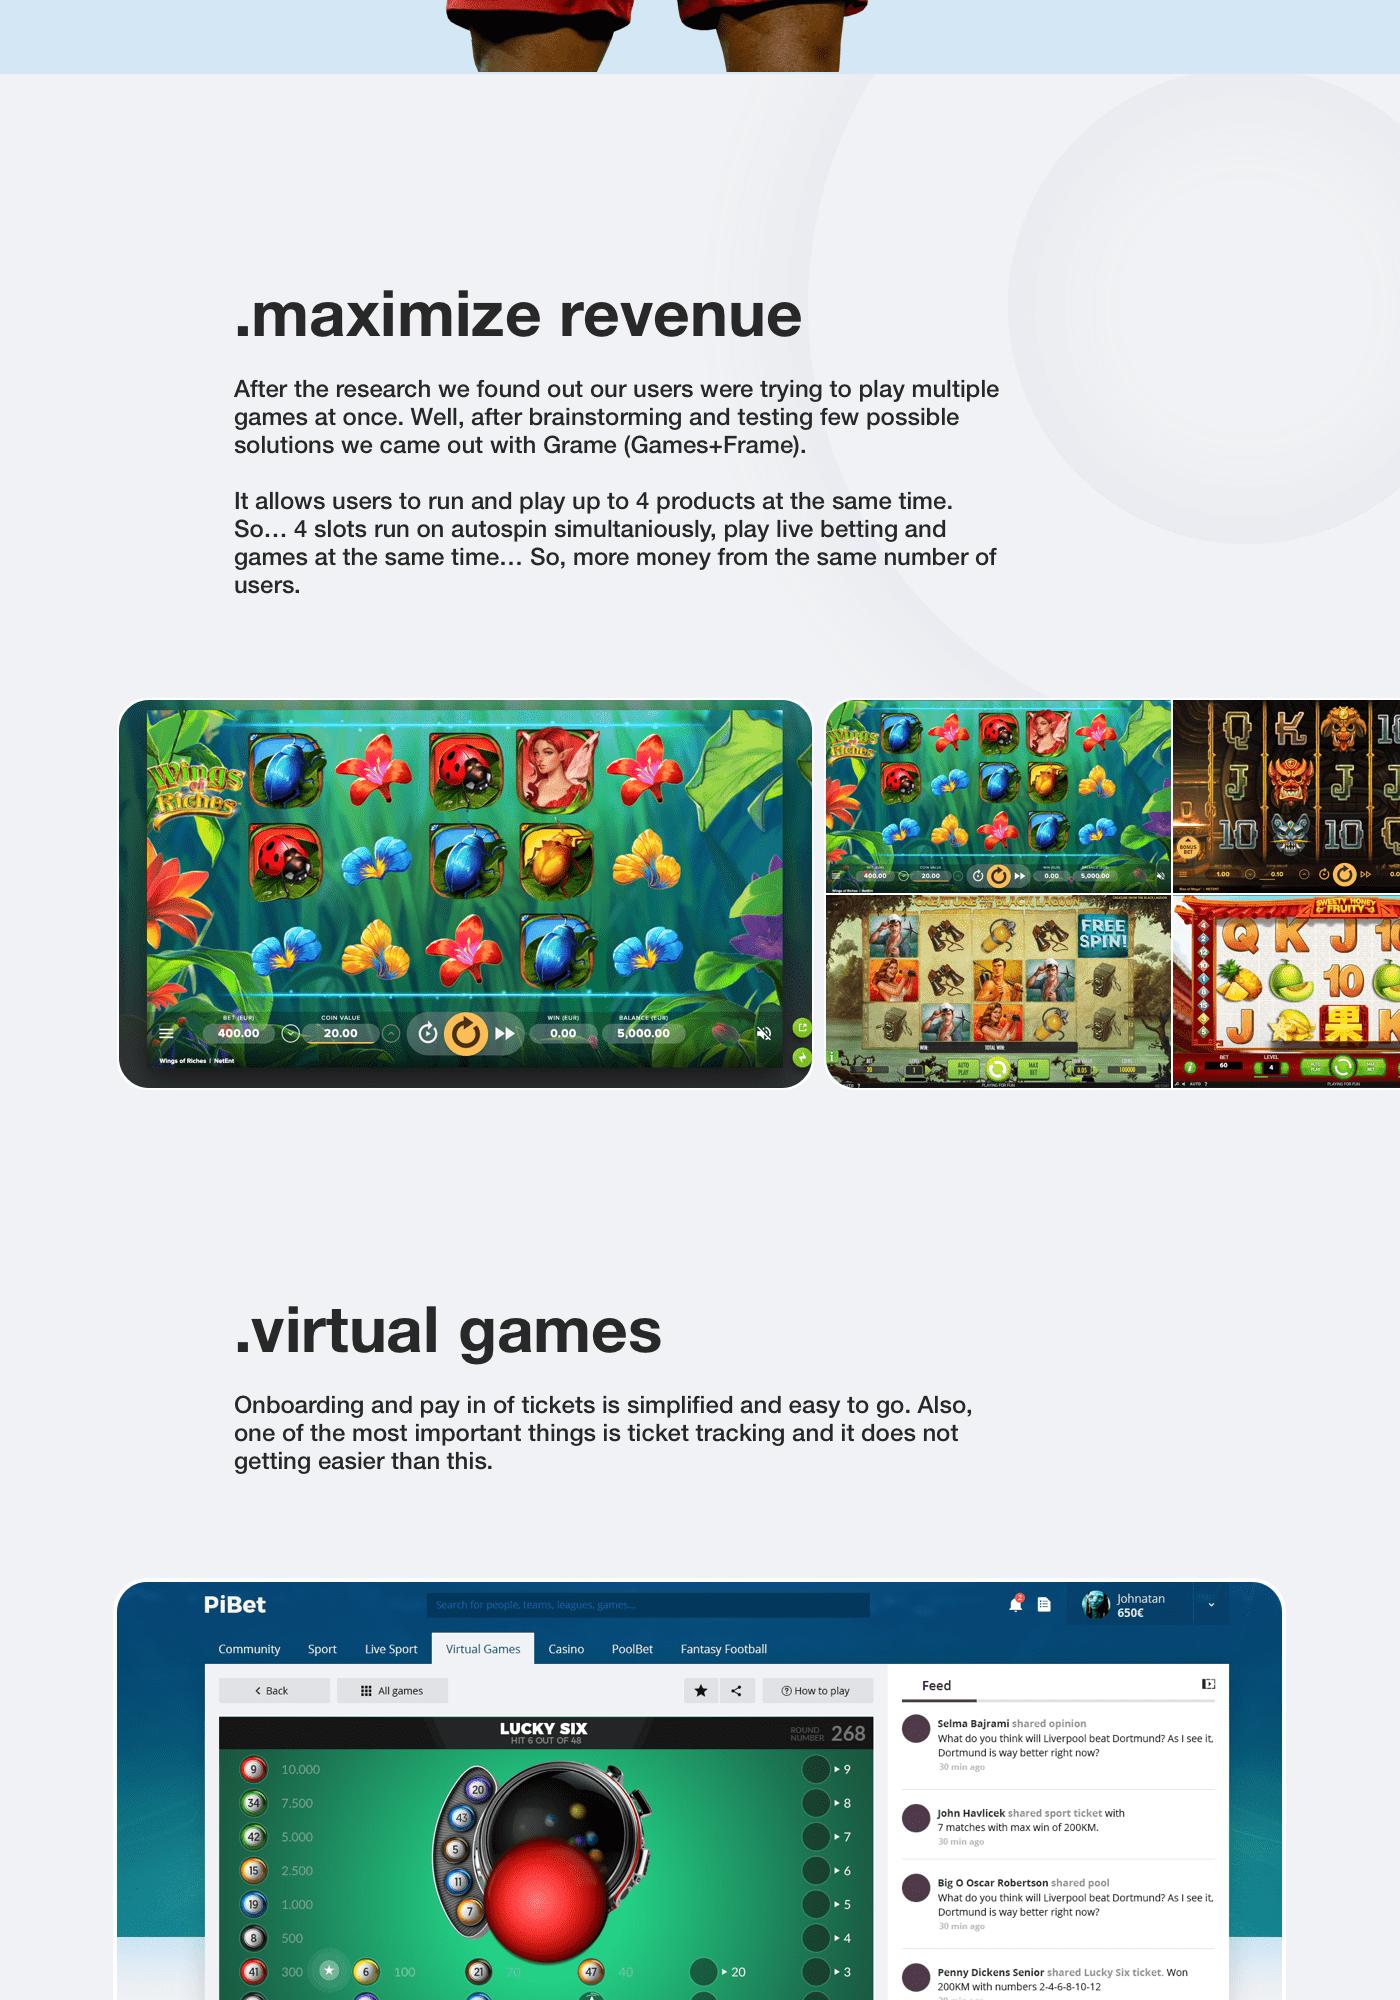 betting casino gambling live betting social sport sport betting Virtual games